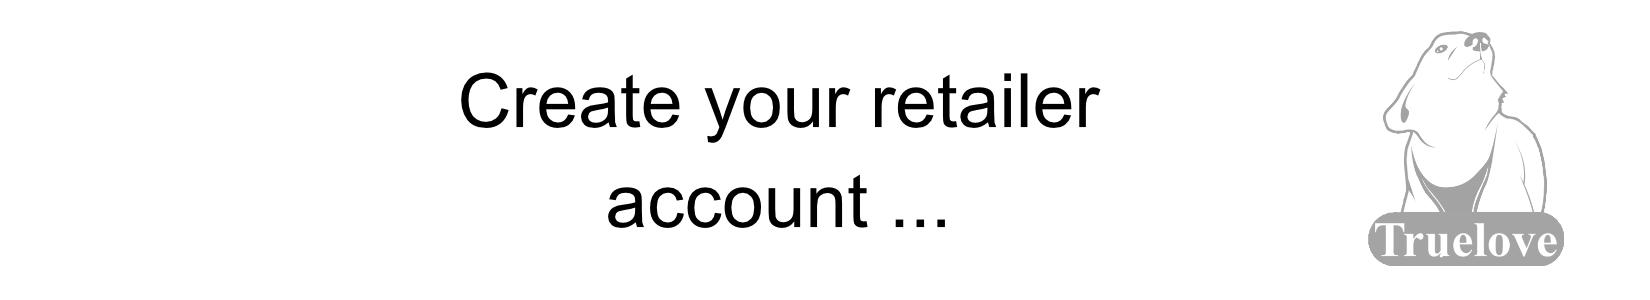 retailer.jpg